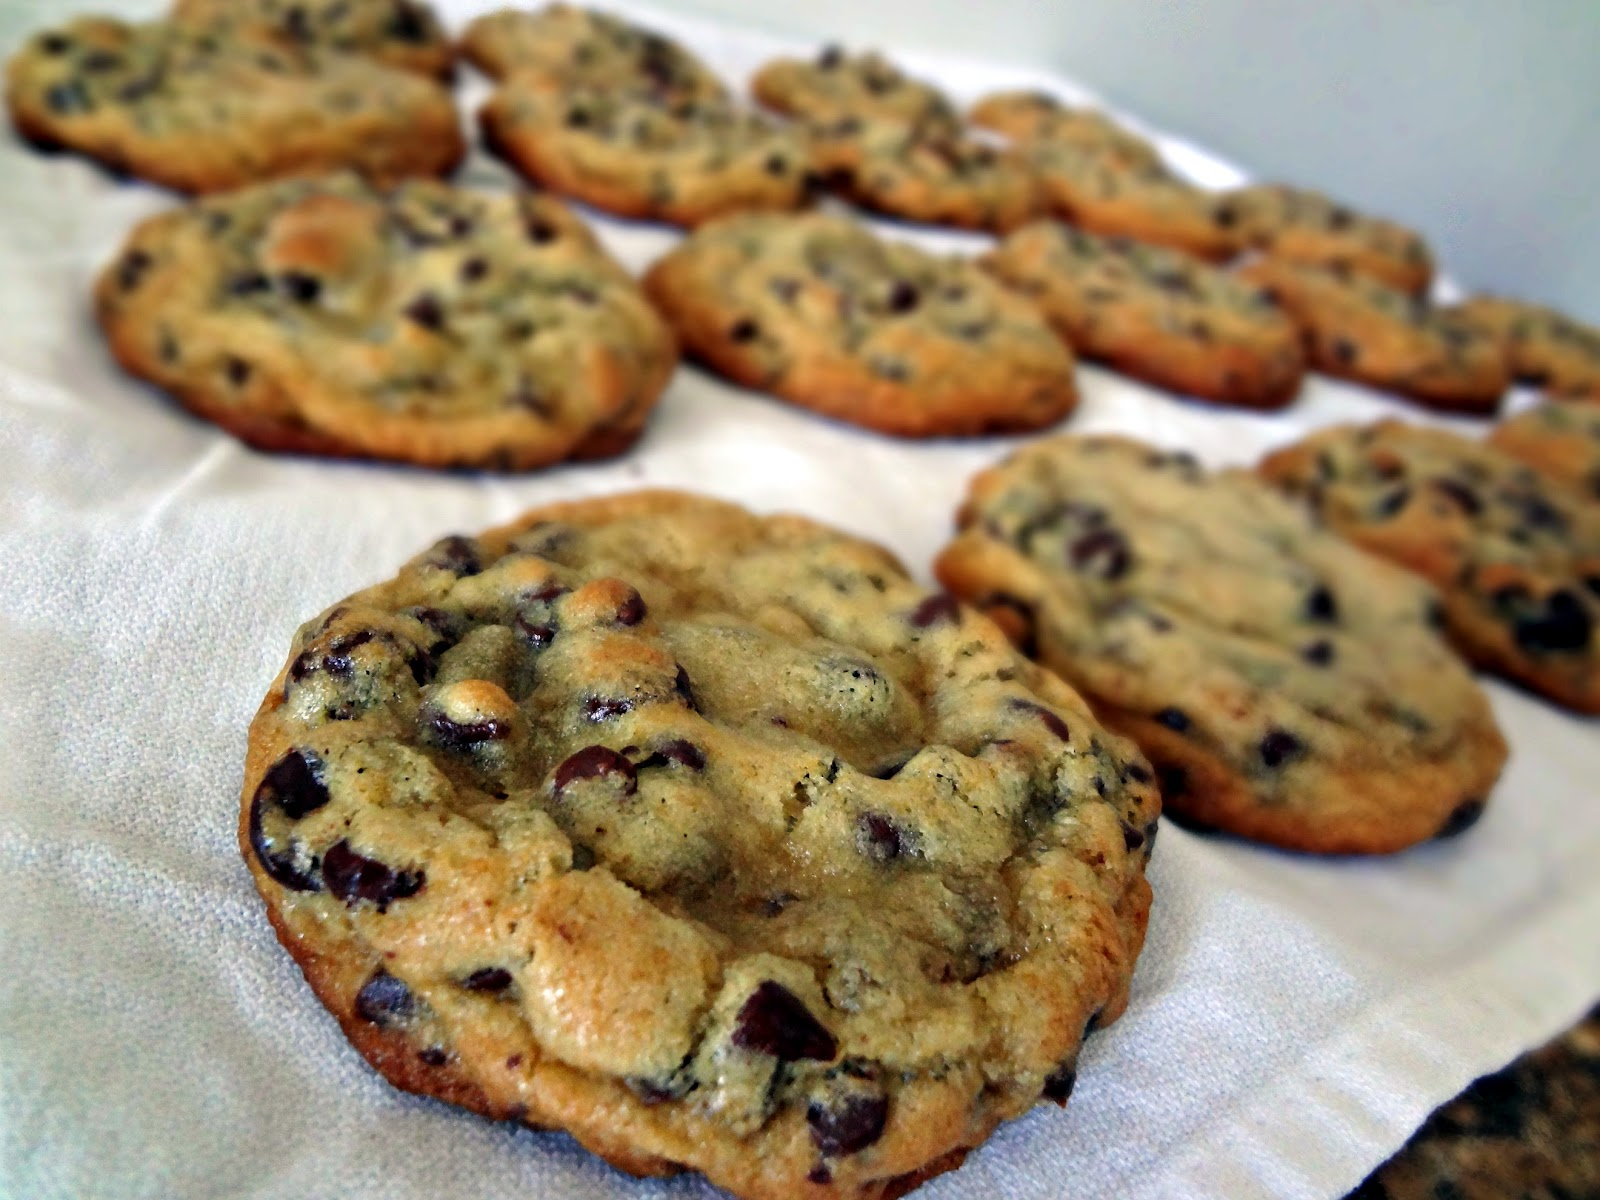 Jamaica: Marijuana-laced cookies the rave among St James ...